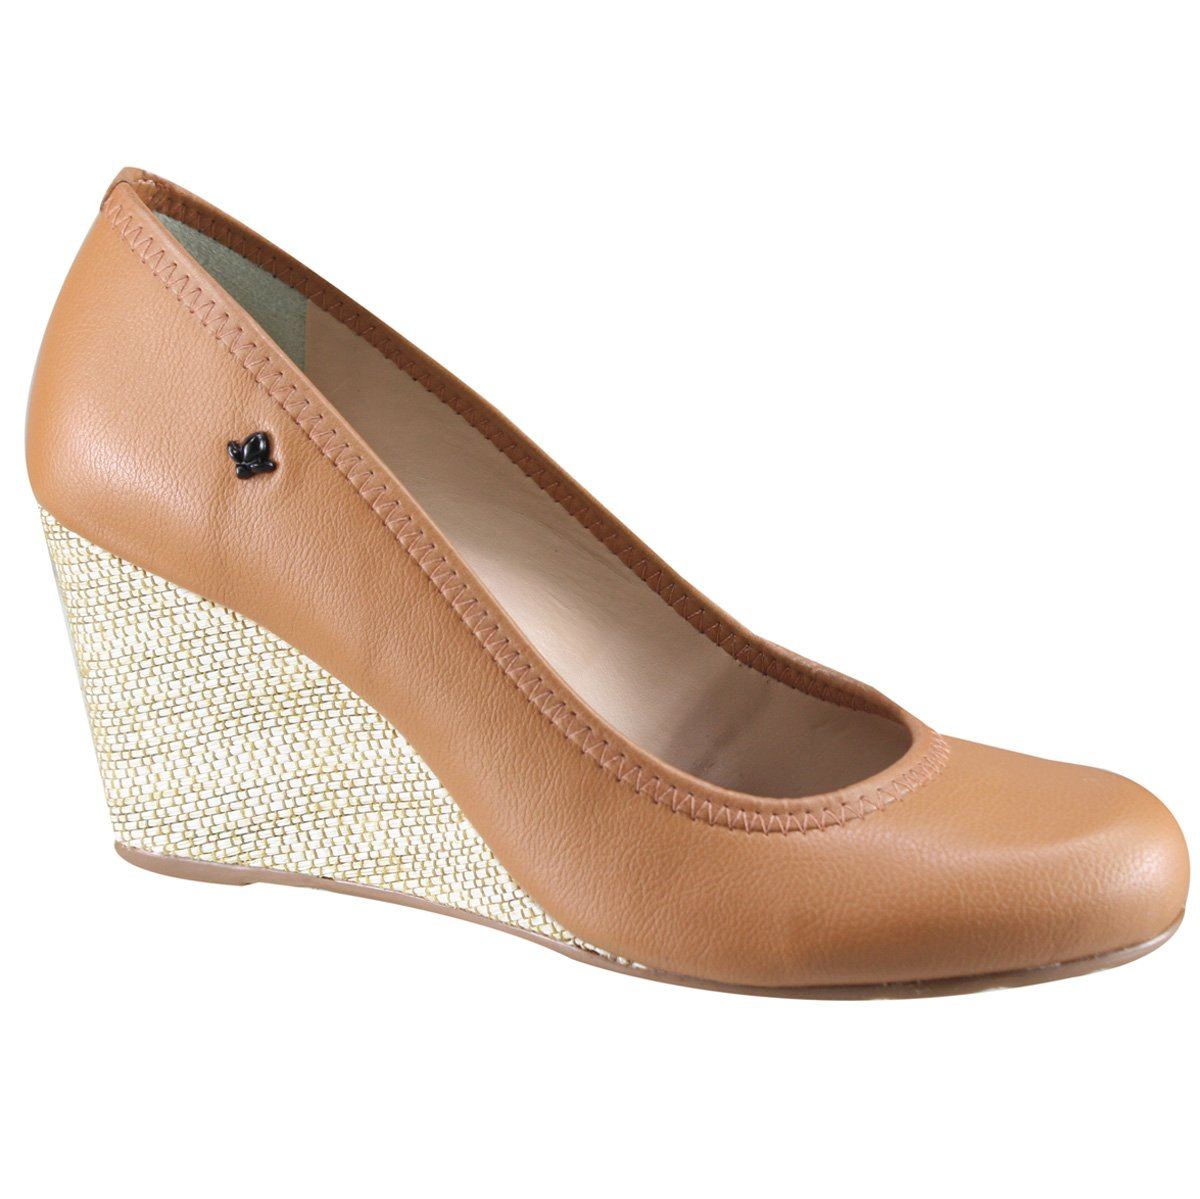 a8577086d Sapato Feminino Anabela Cravo e Canela 158001 3 - Ambar (Matelasse ...